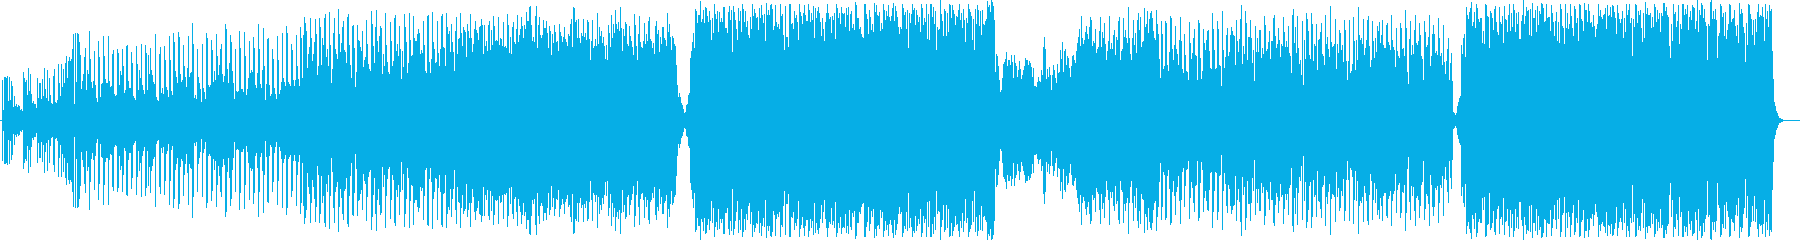 C-POPで暖かい曲の再生済みの波形